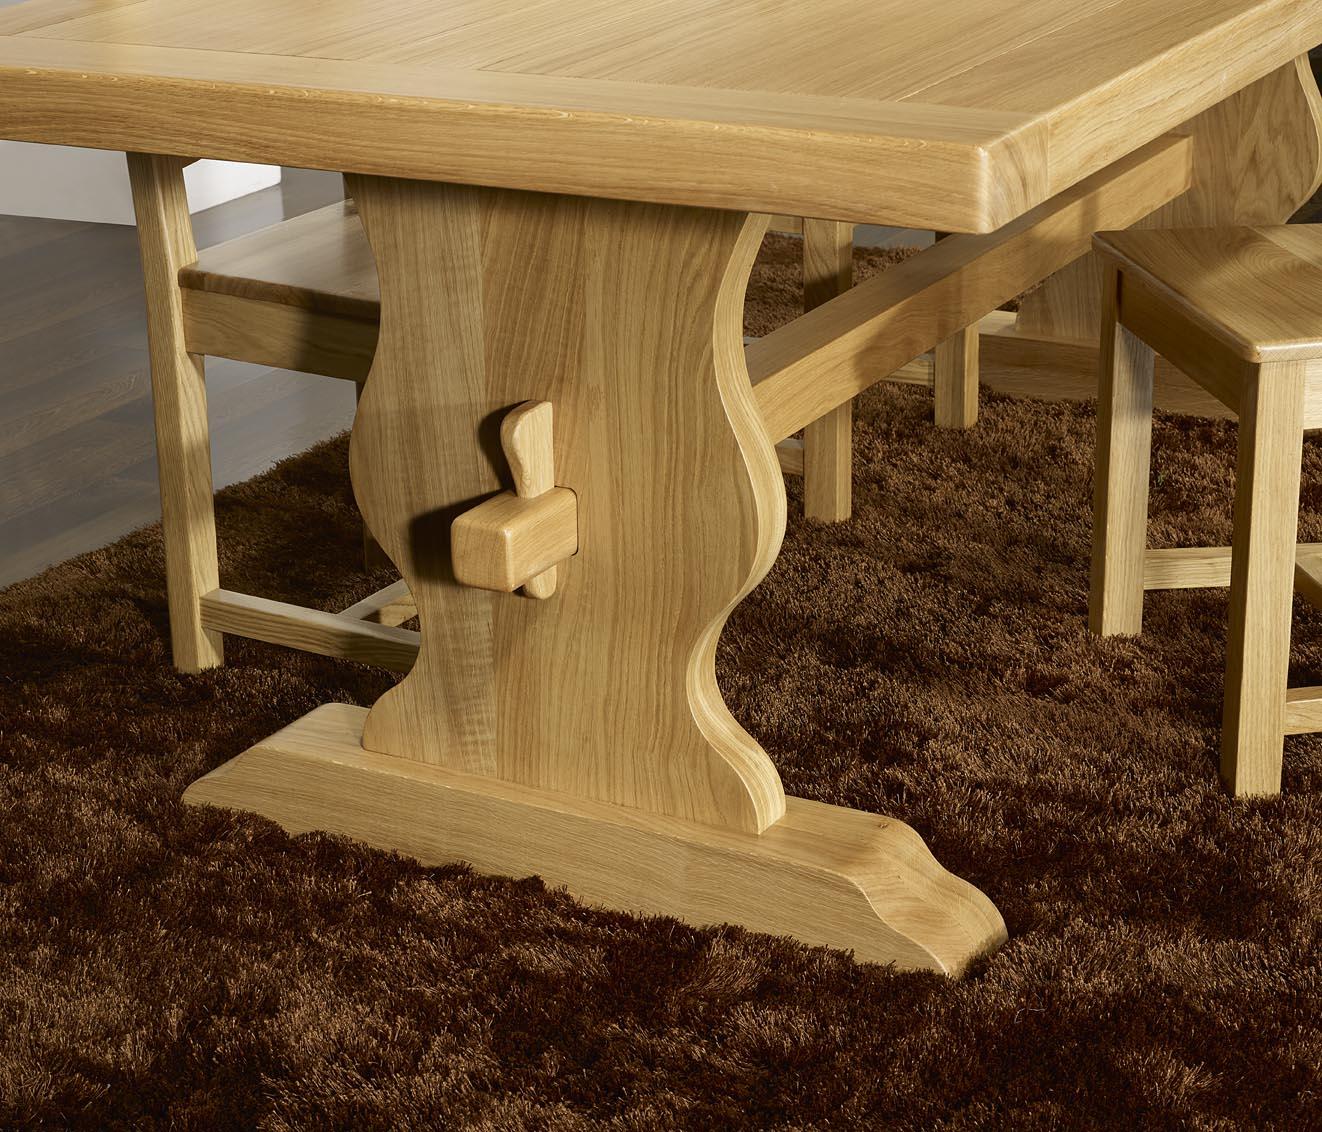 table monast re 200x100 en ch ne massif meuble en ch ne massif. Black Bedroom Furniture Sets. Home Design Ideas